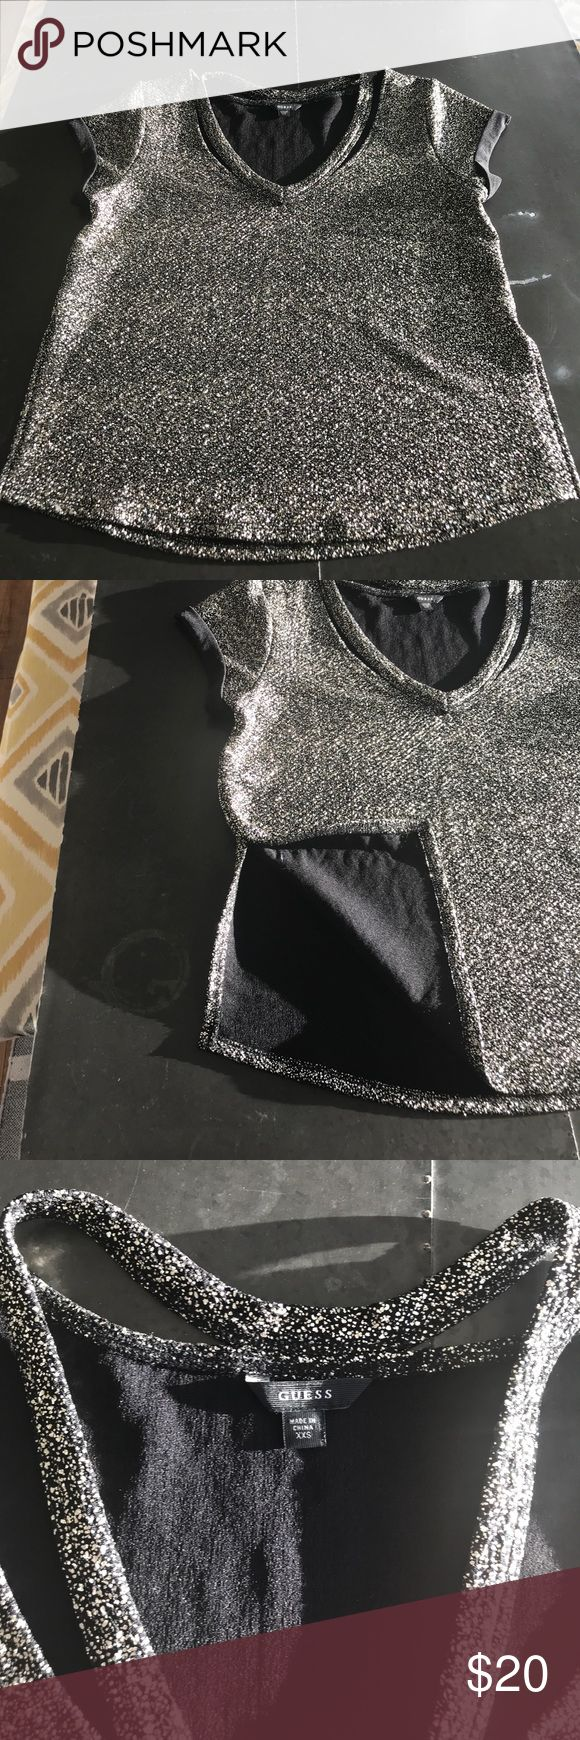 Metallic short sleeve shirt Metallic shirt (not sequin) with cutout neck and side slits. Guess Tops Tees - Short Sleeve